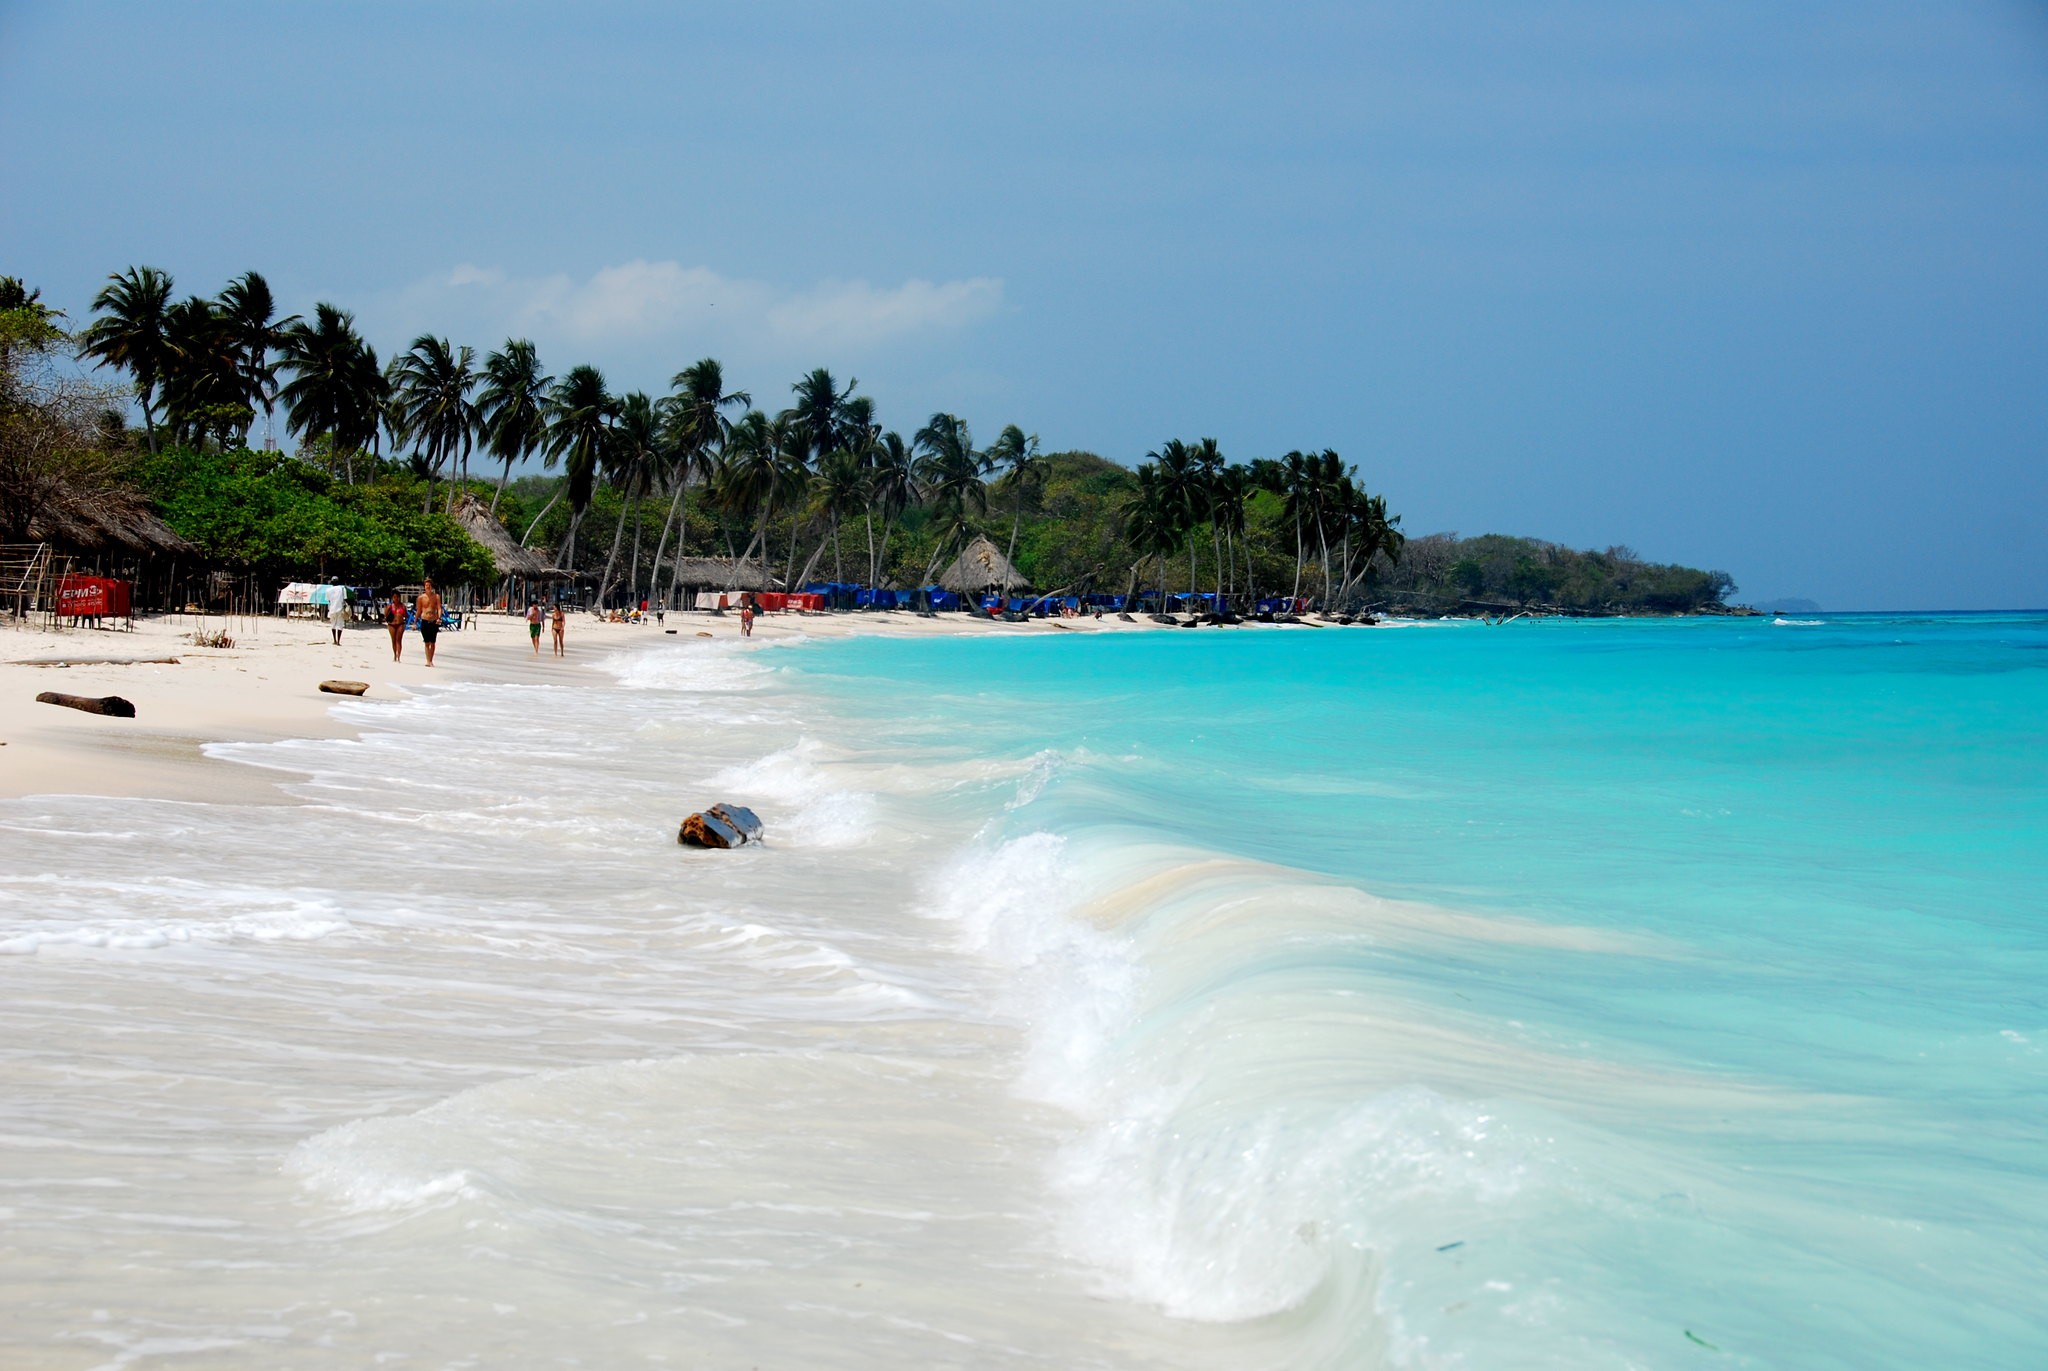 beaches near medellin la playa blanca